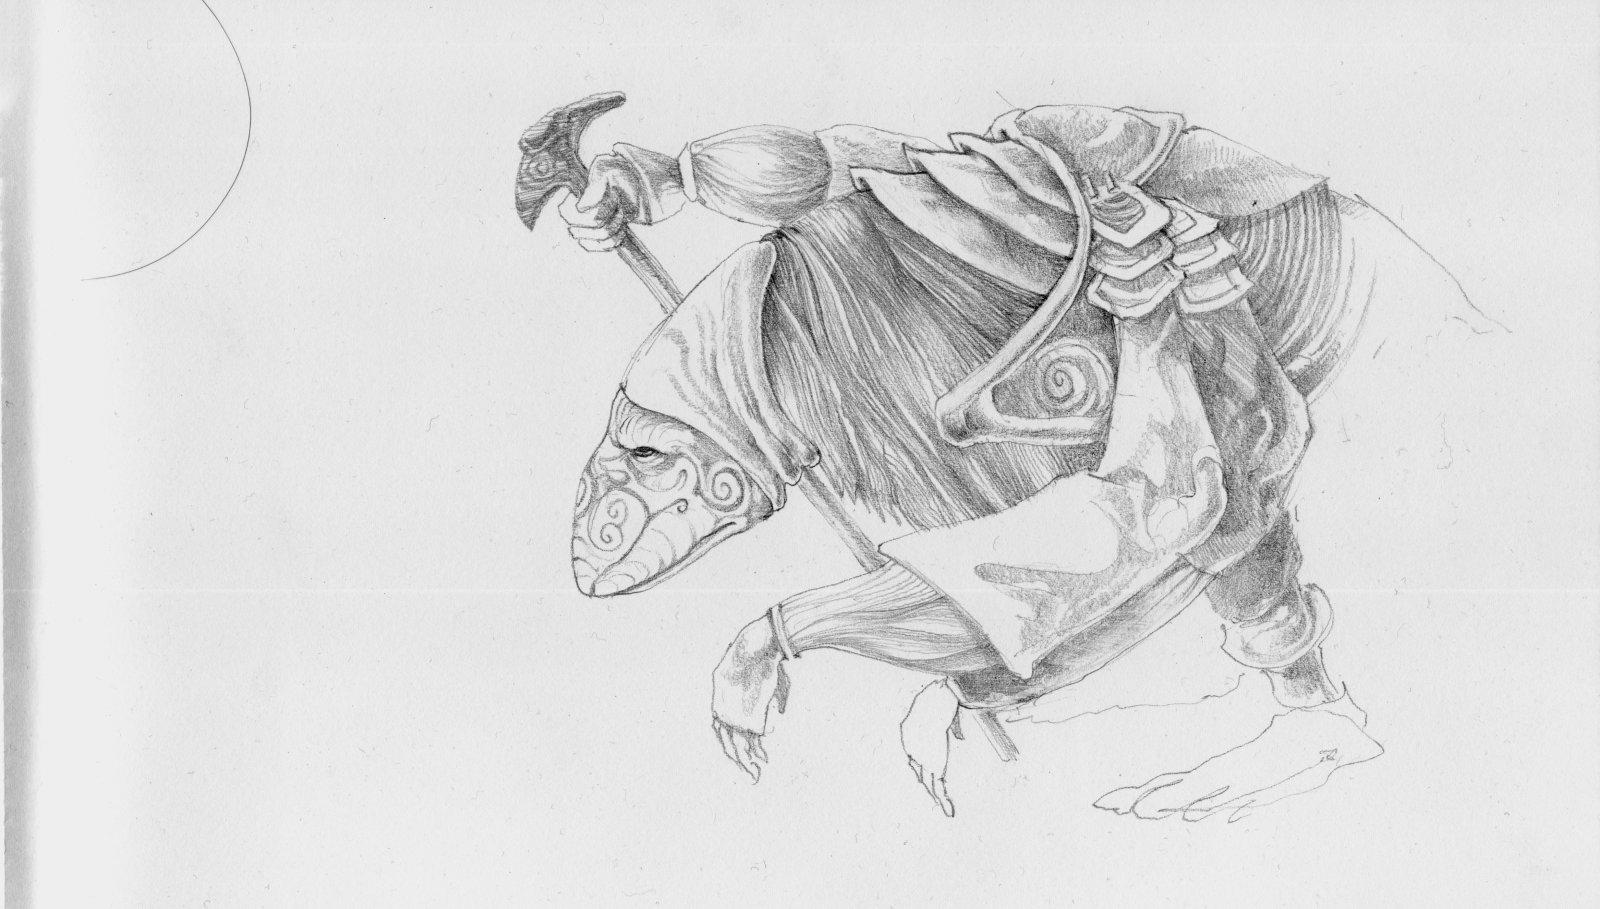 Mystic sketch